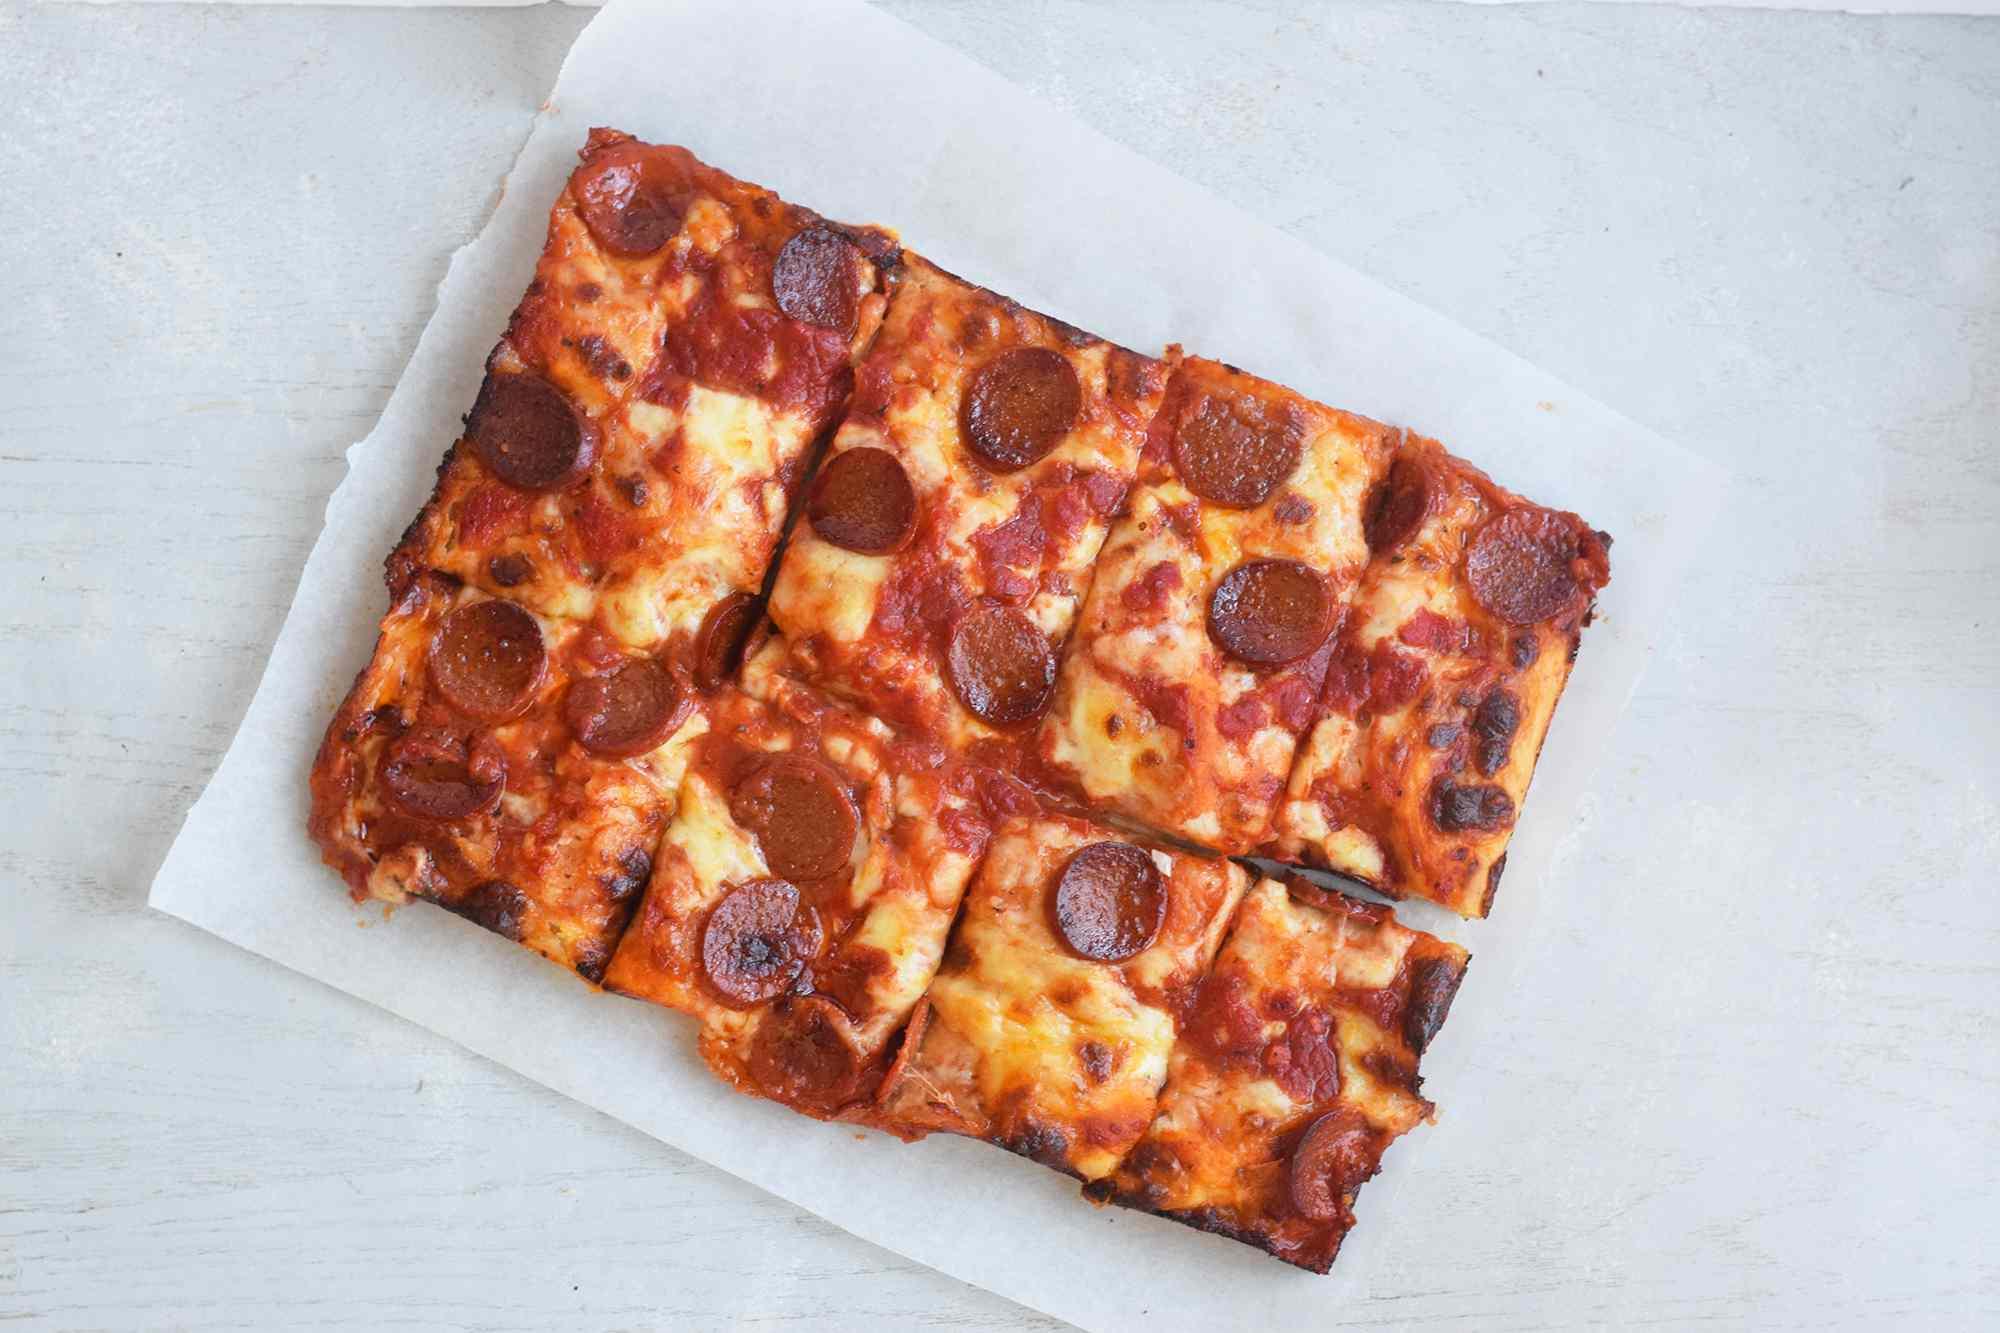 Sliced Detroit style pizza